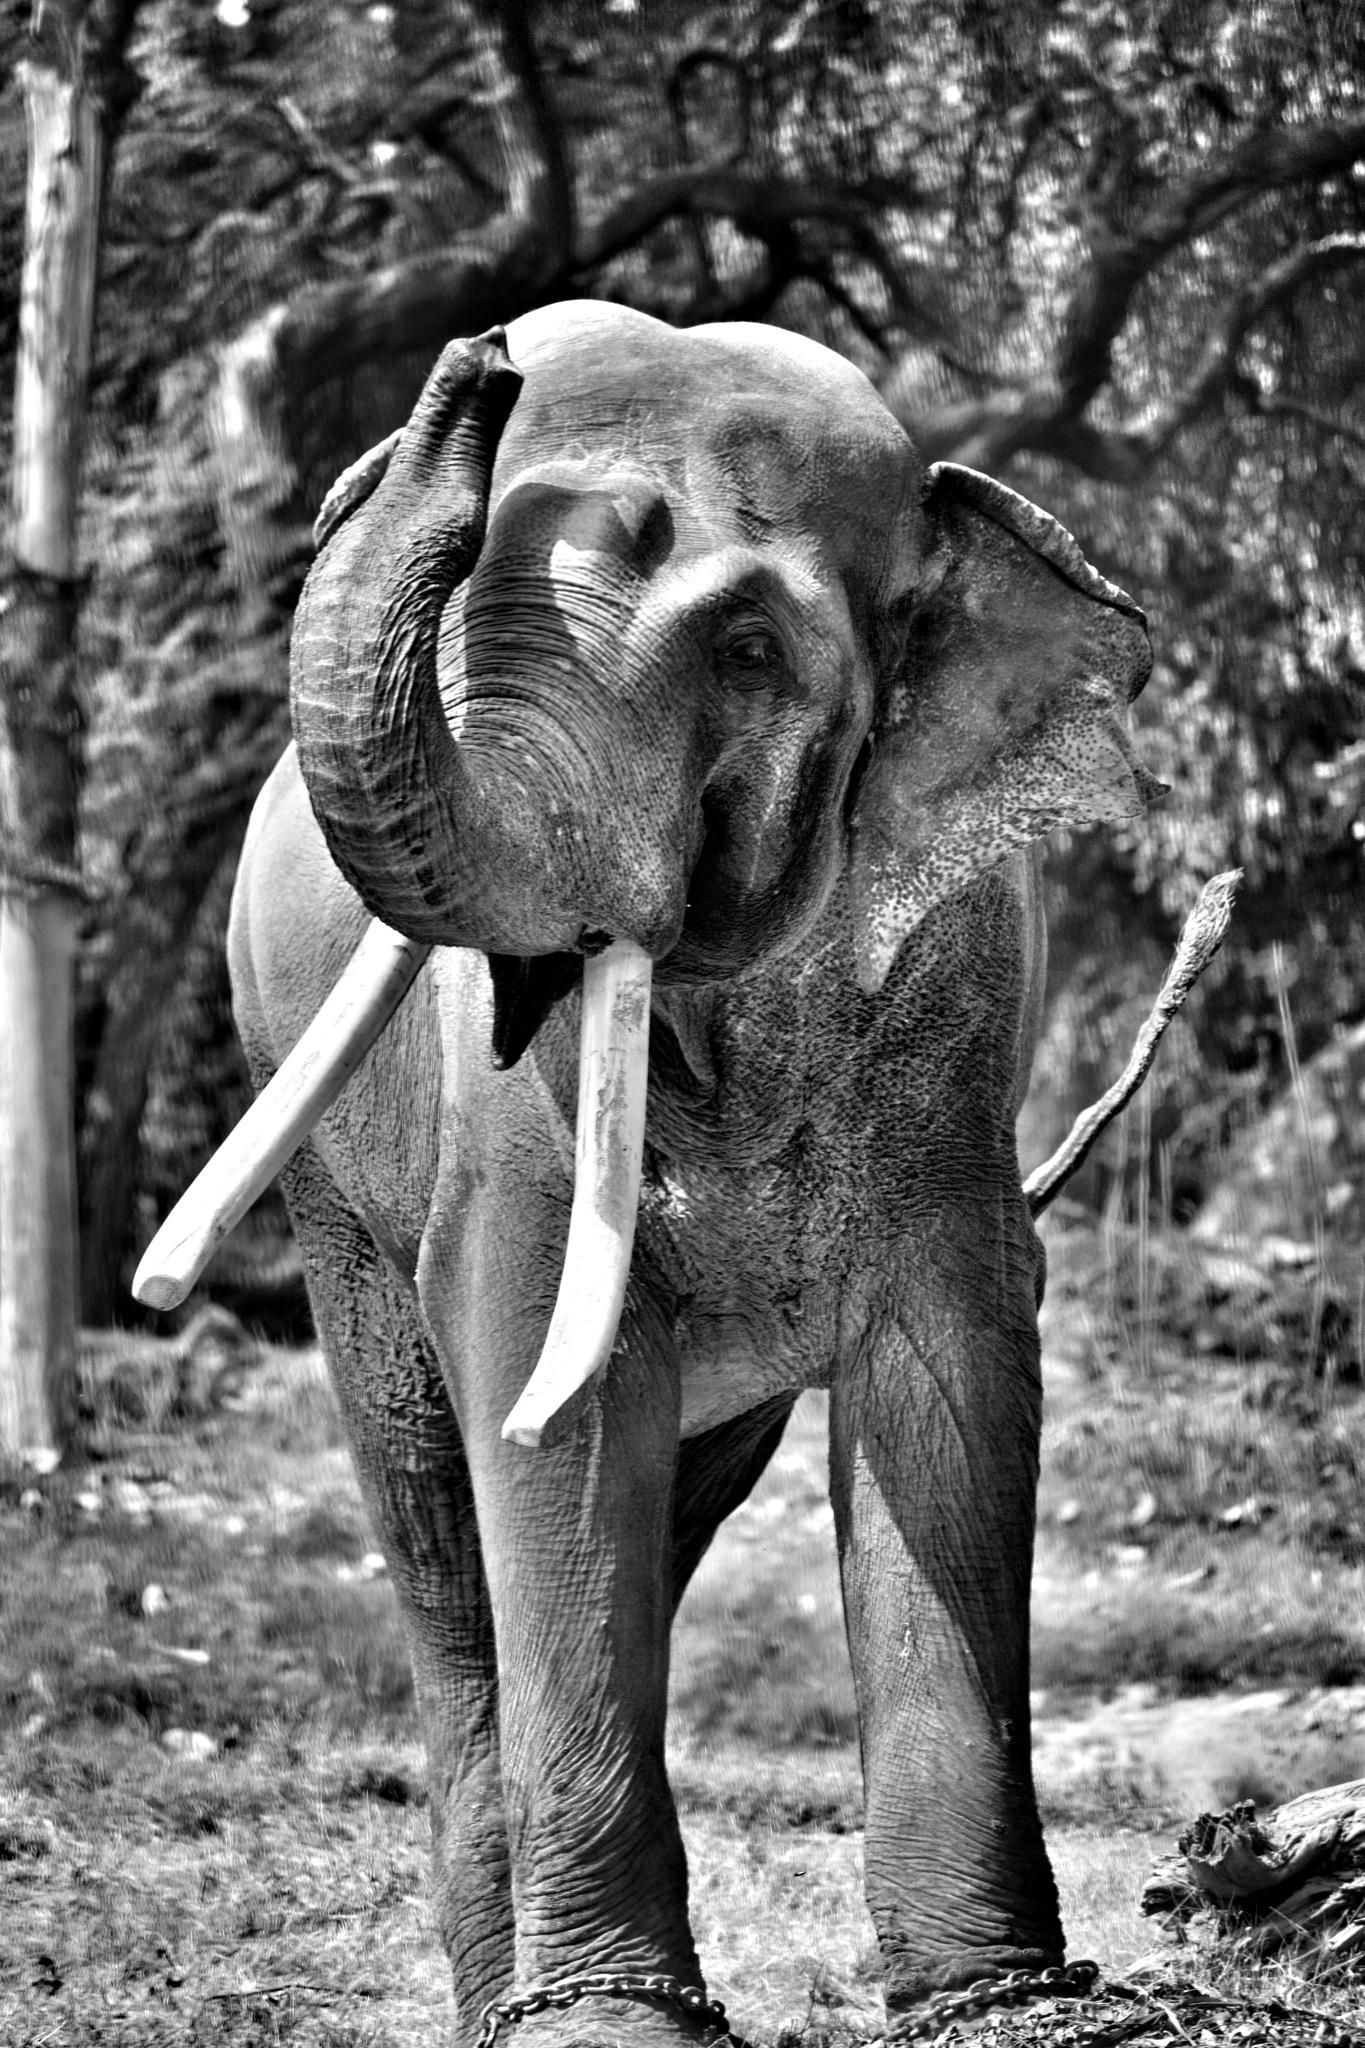 Elephant by Arvind Kumar Yadav